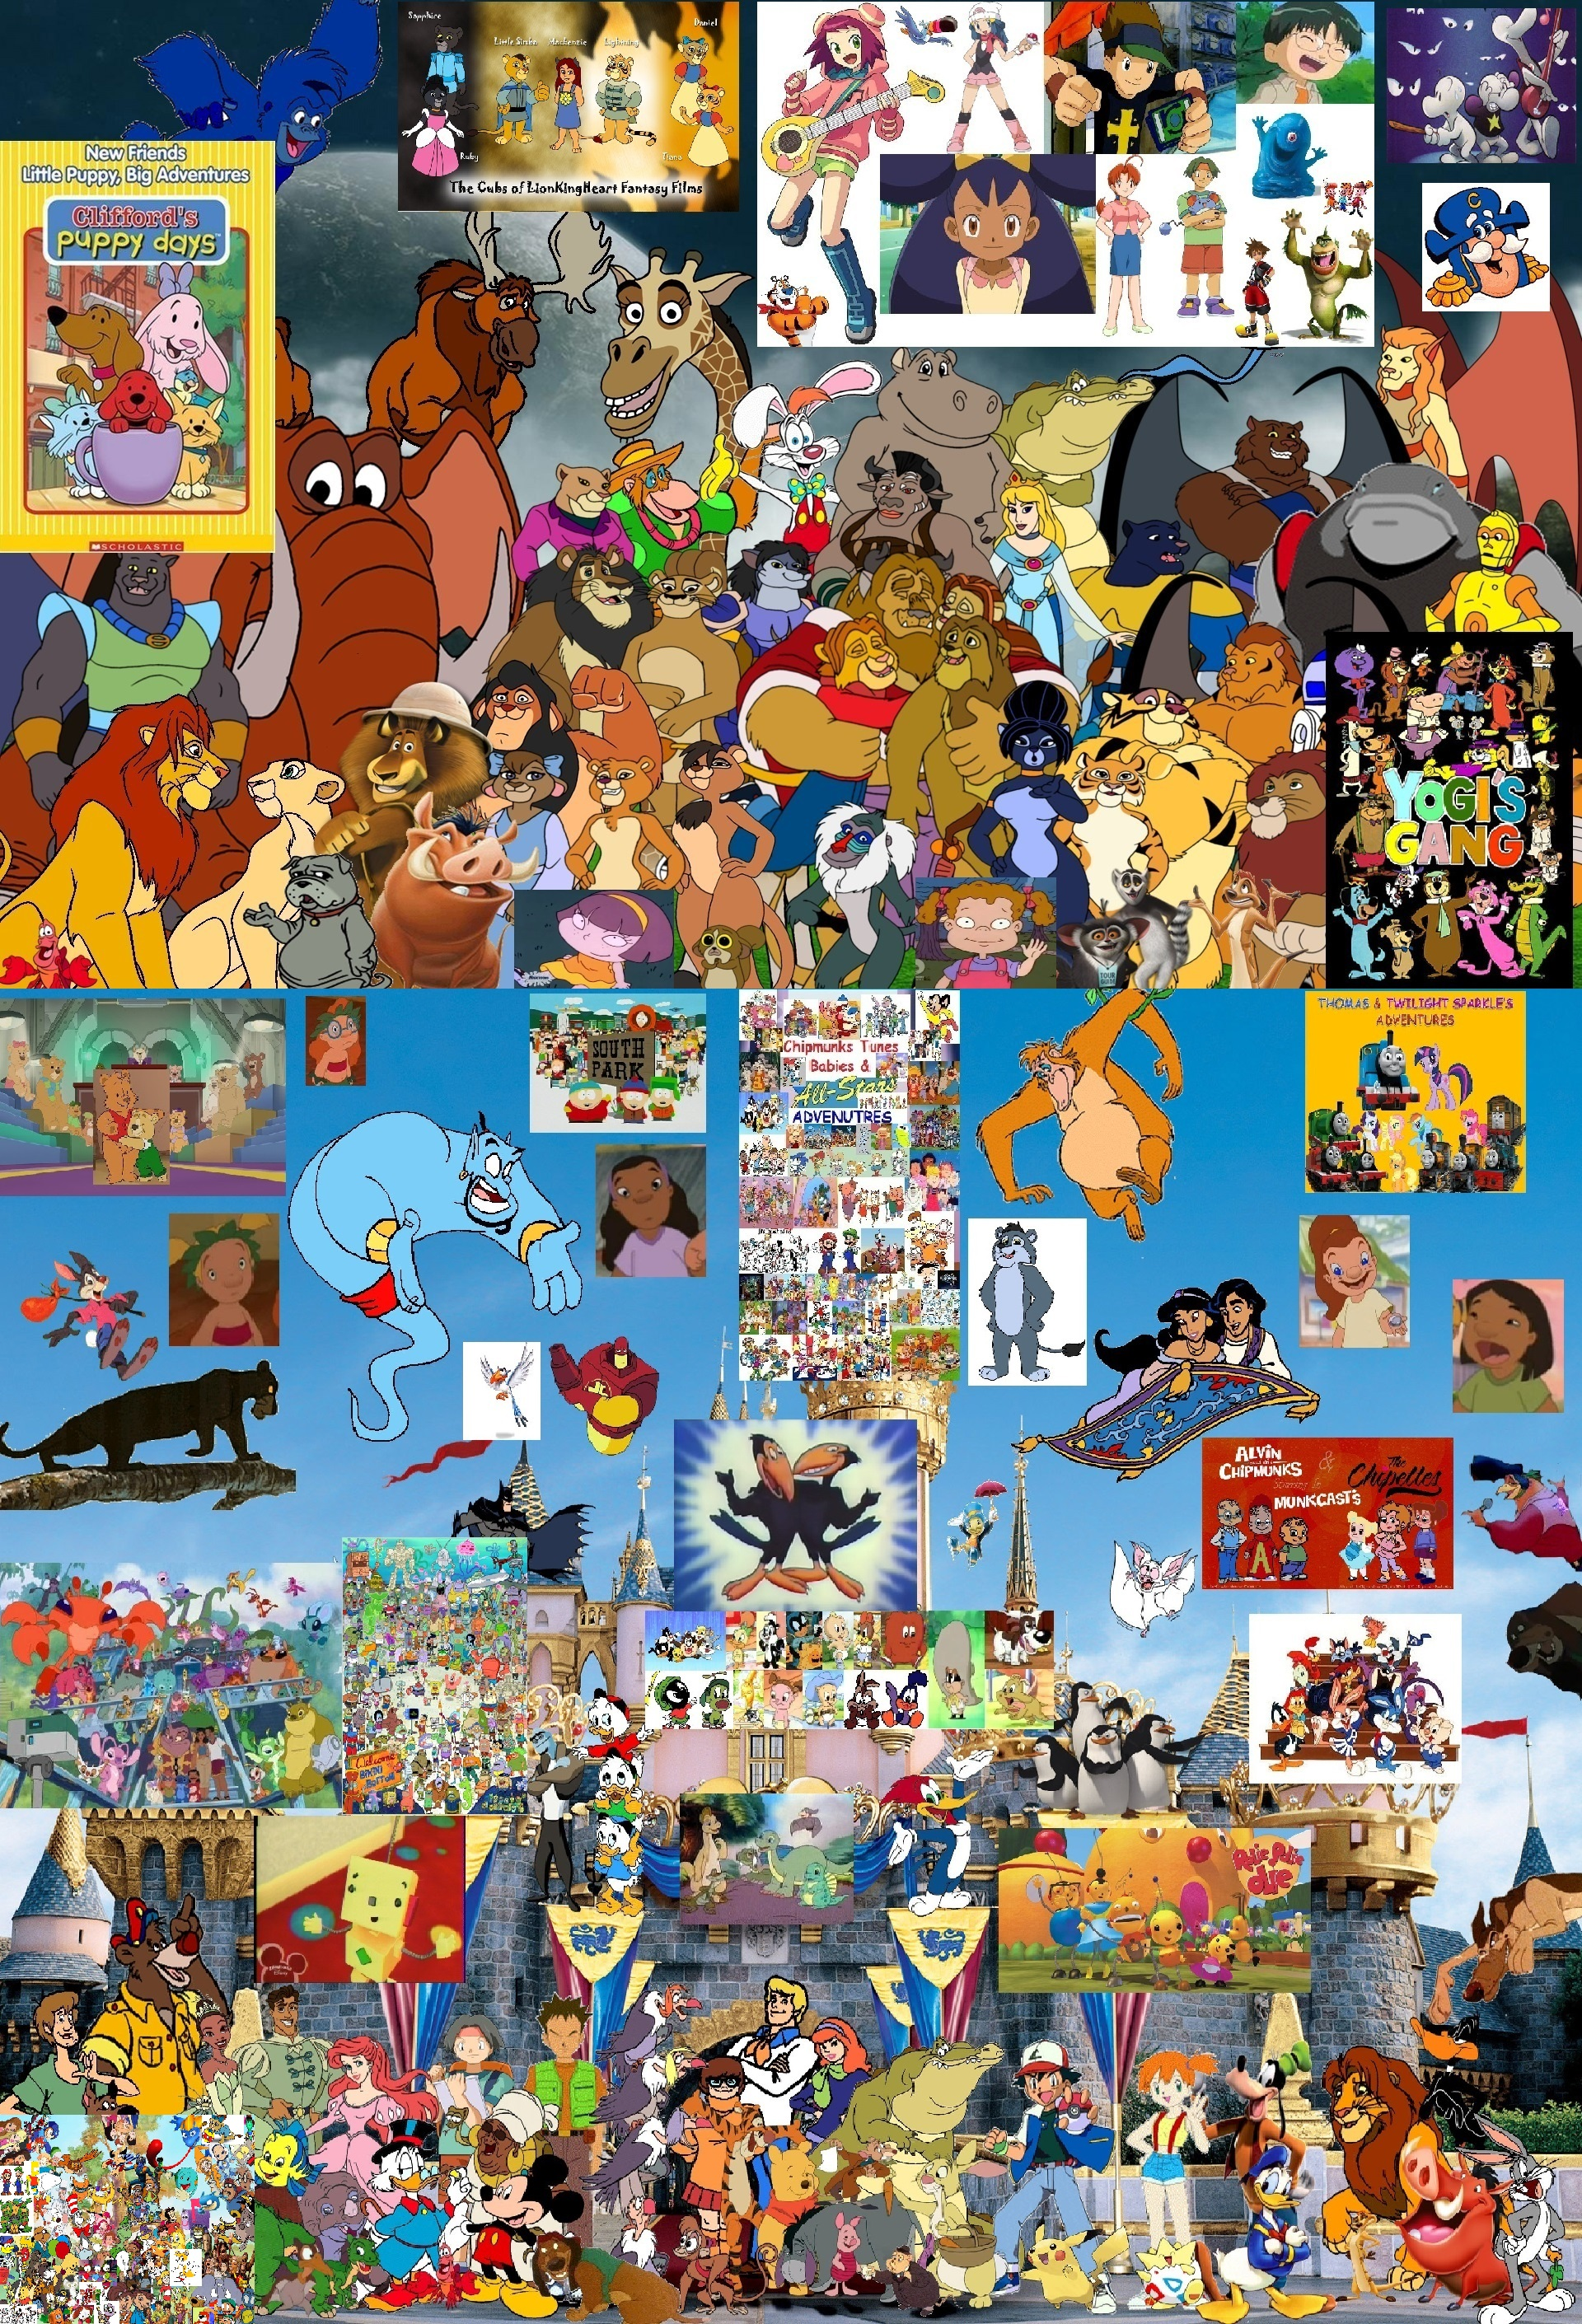 image chipmunks tunes babies and allstars adventures